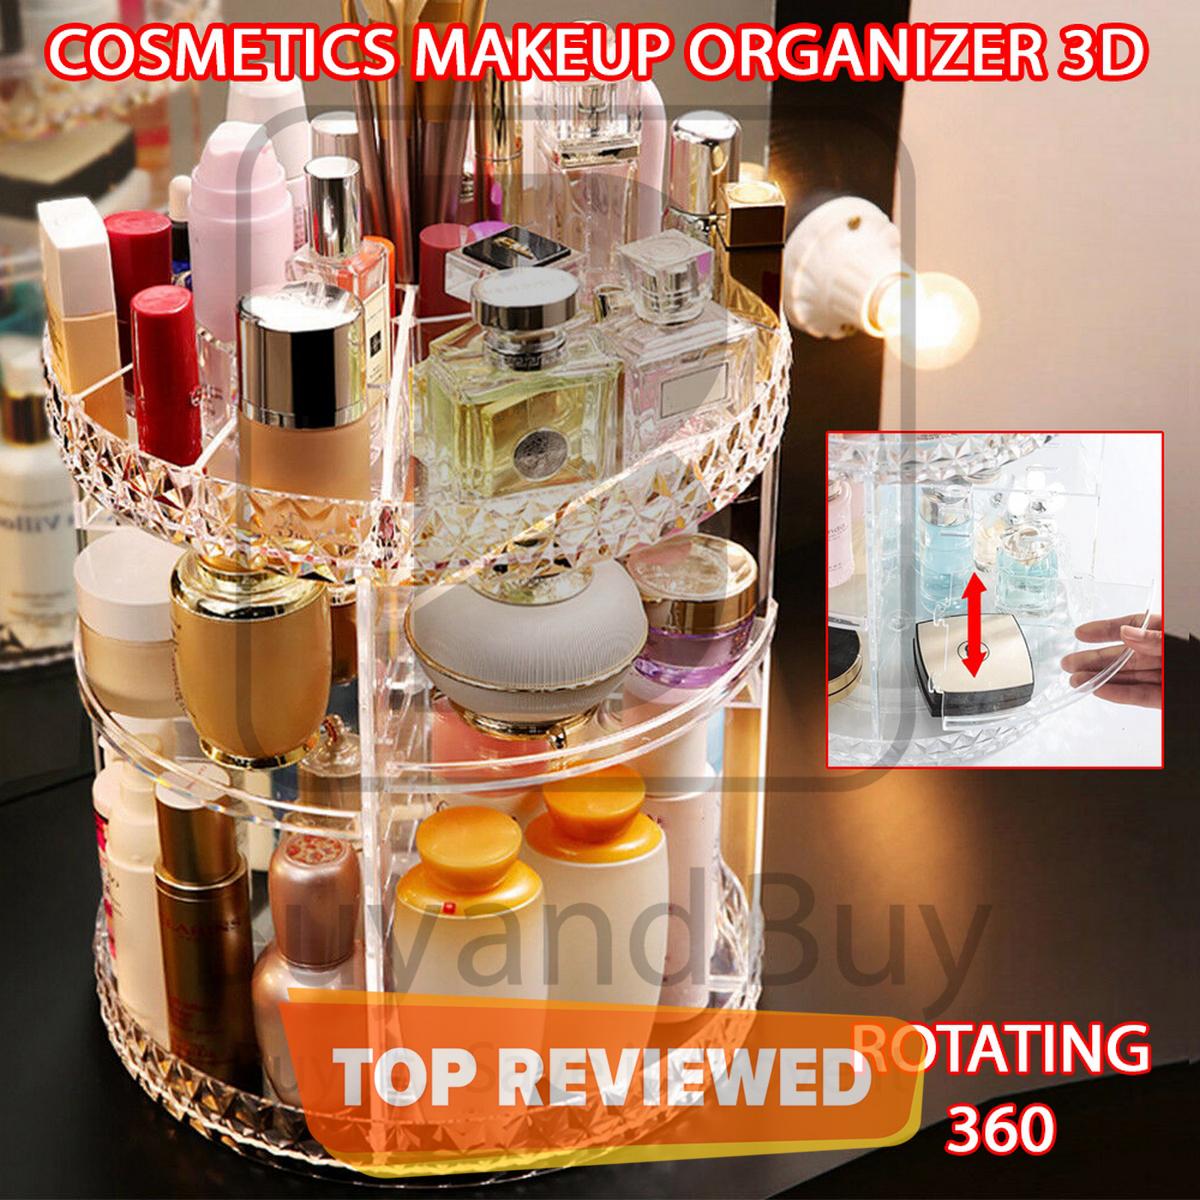 (MINOR SCRATCH BUT BEST PRICE LOWEST PRICE) Cosmetics Makeup Organizer 3D Rotating 360